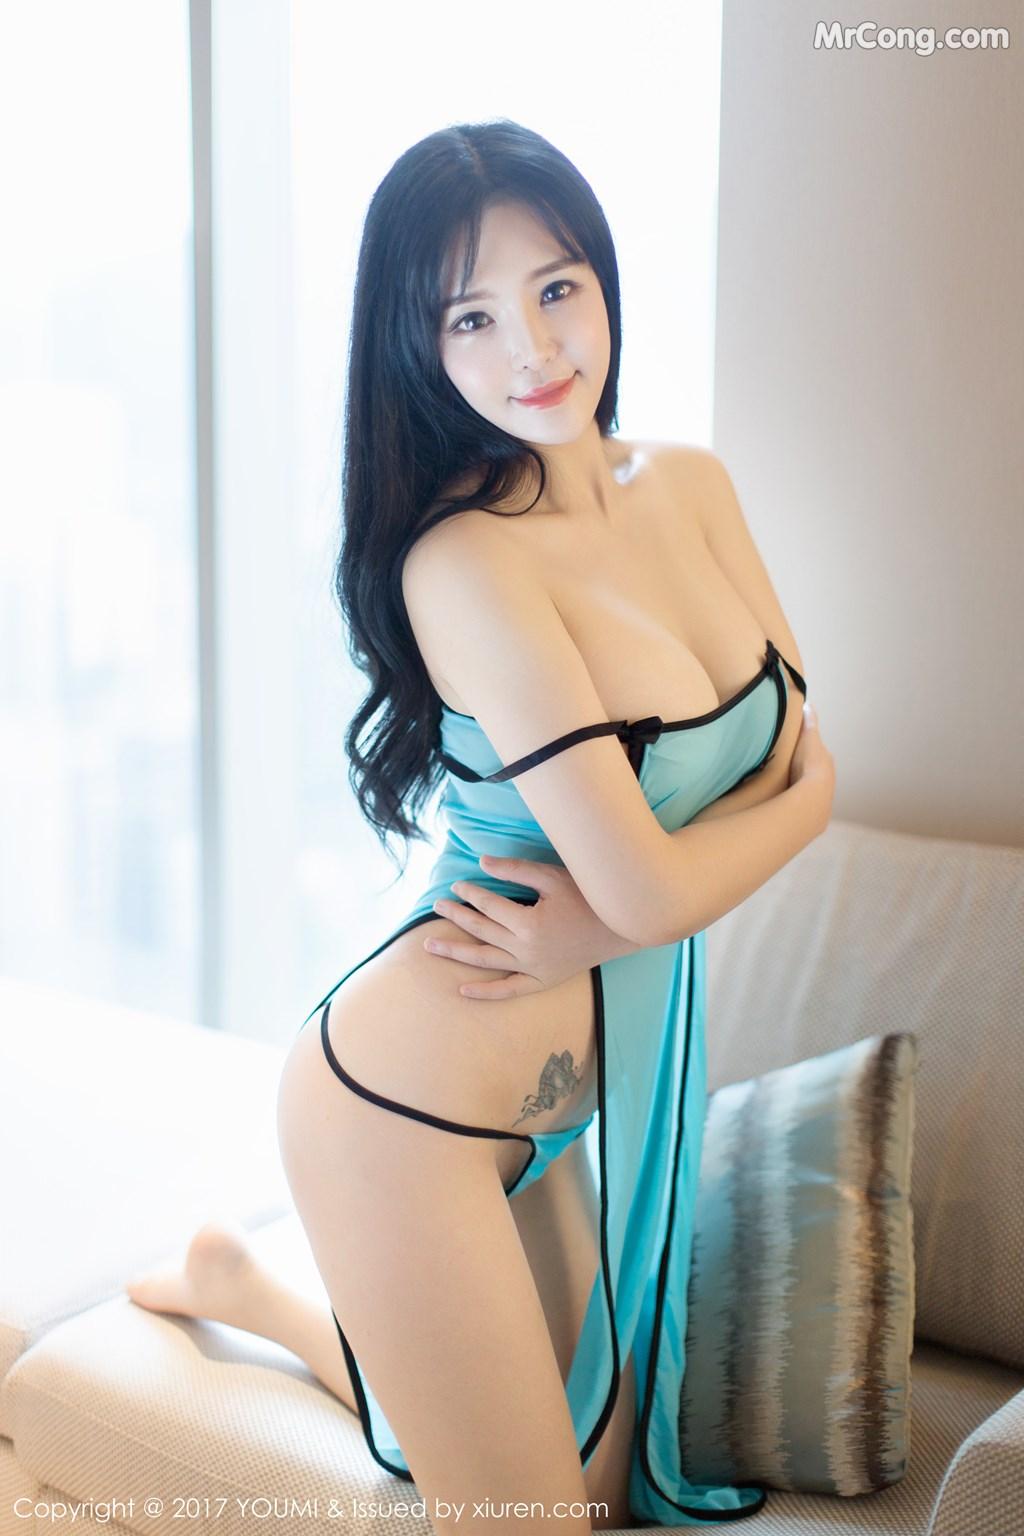 Image YouMi-No.067-Liu-Yu-Er-MrCong.com-044 in post YouMi No.067: Người mẫu Liu Yu Er (刘钰儿) (45 ảnh)